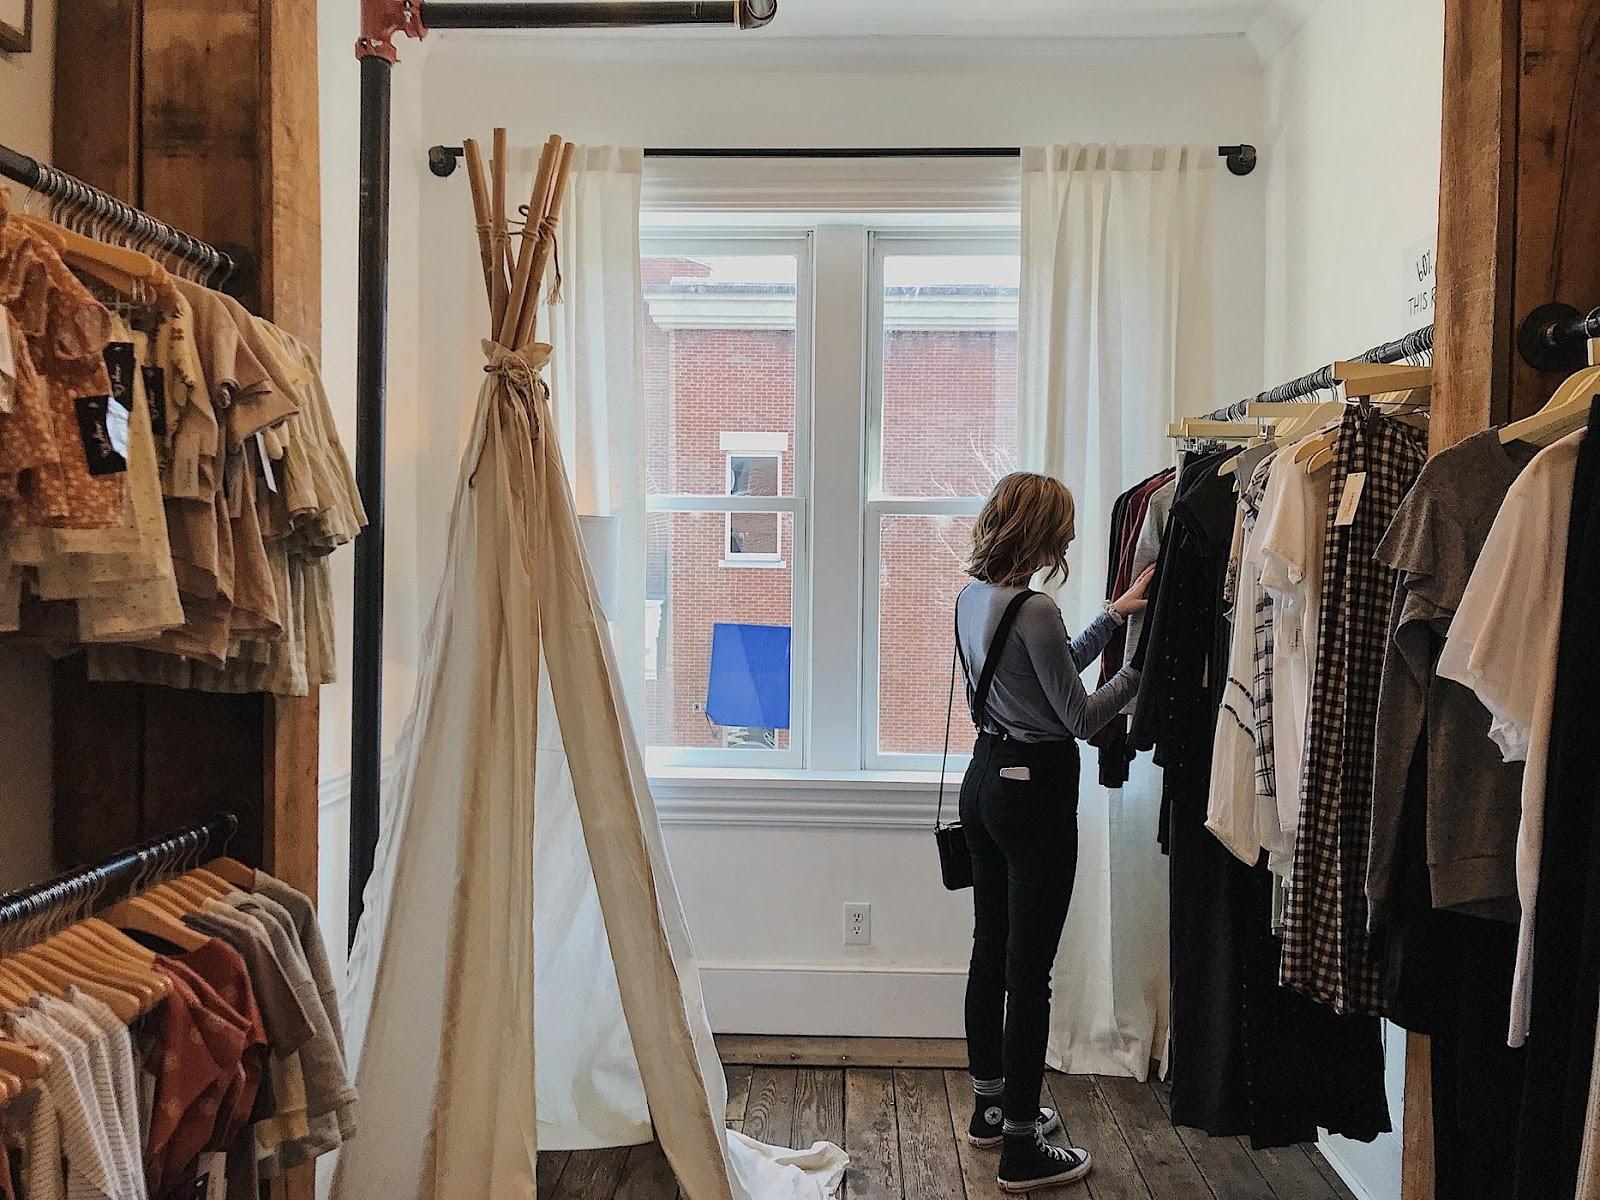 Pop-up shops browsing